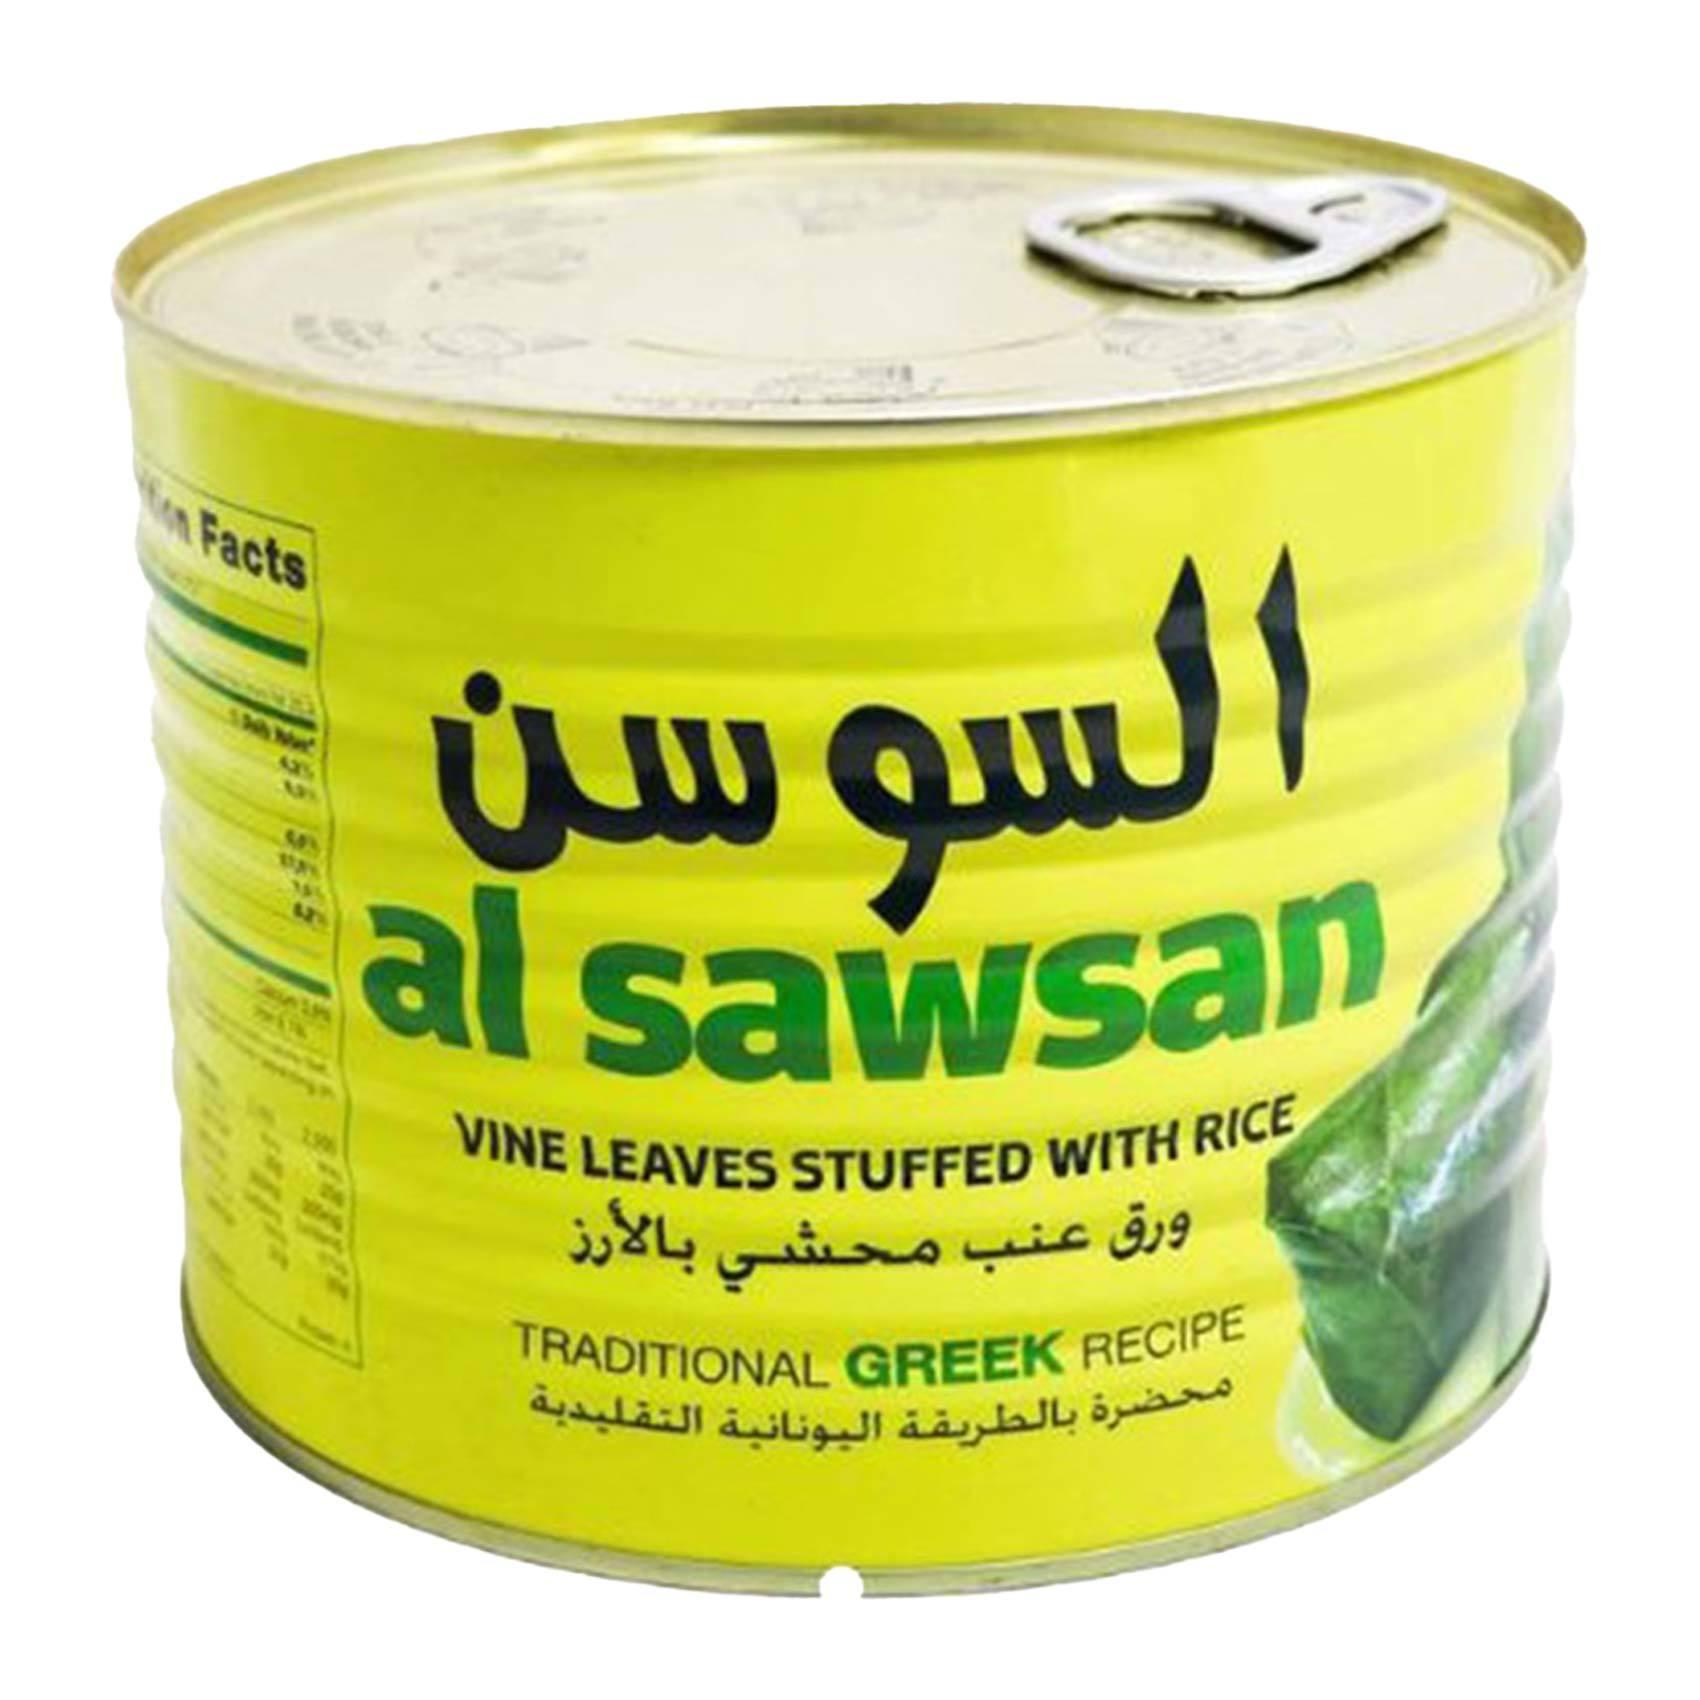 Buy Alsawsan Vine Leaves Stuffed With Rice 2 Kg Online Shop Food Cupboard On Carrefour Saudi Arabia